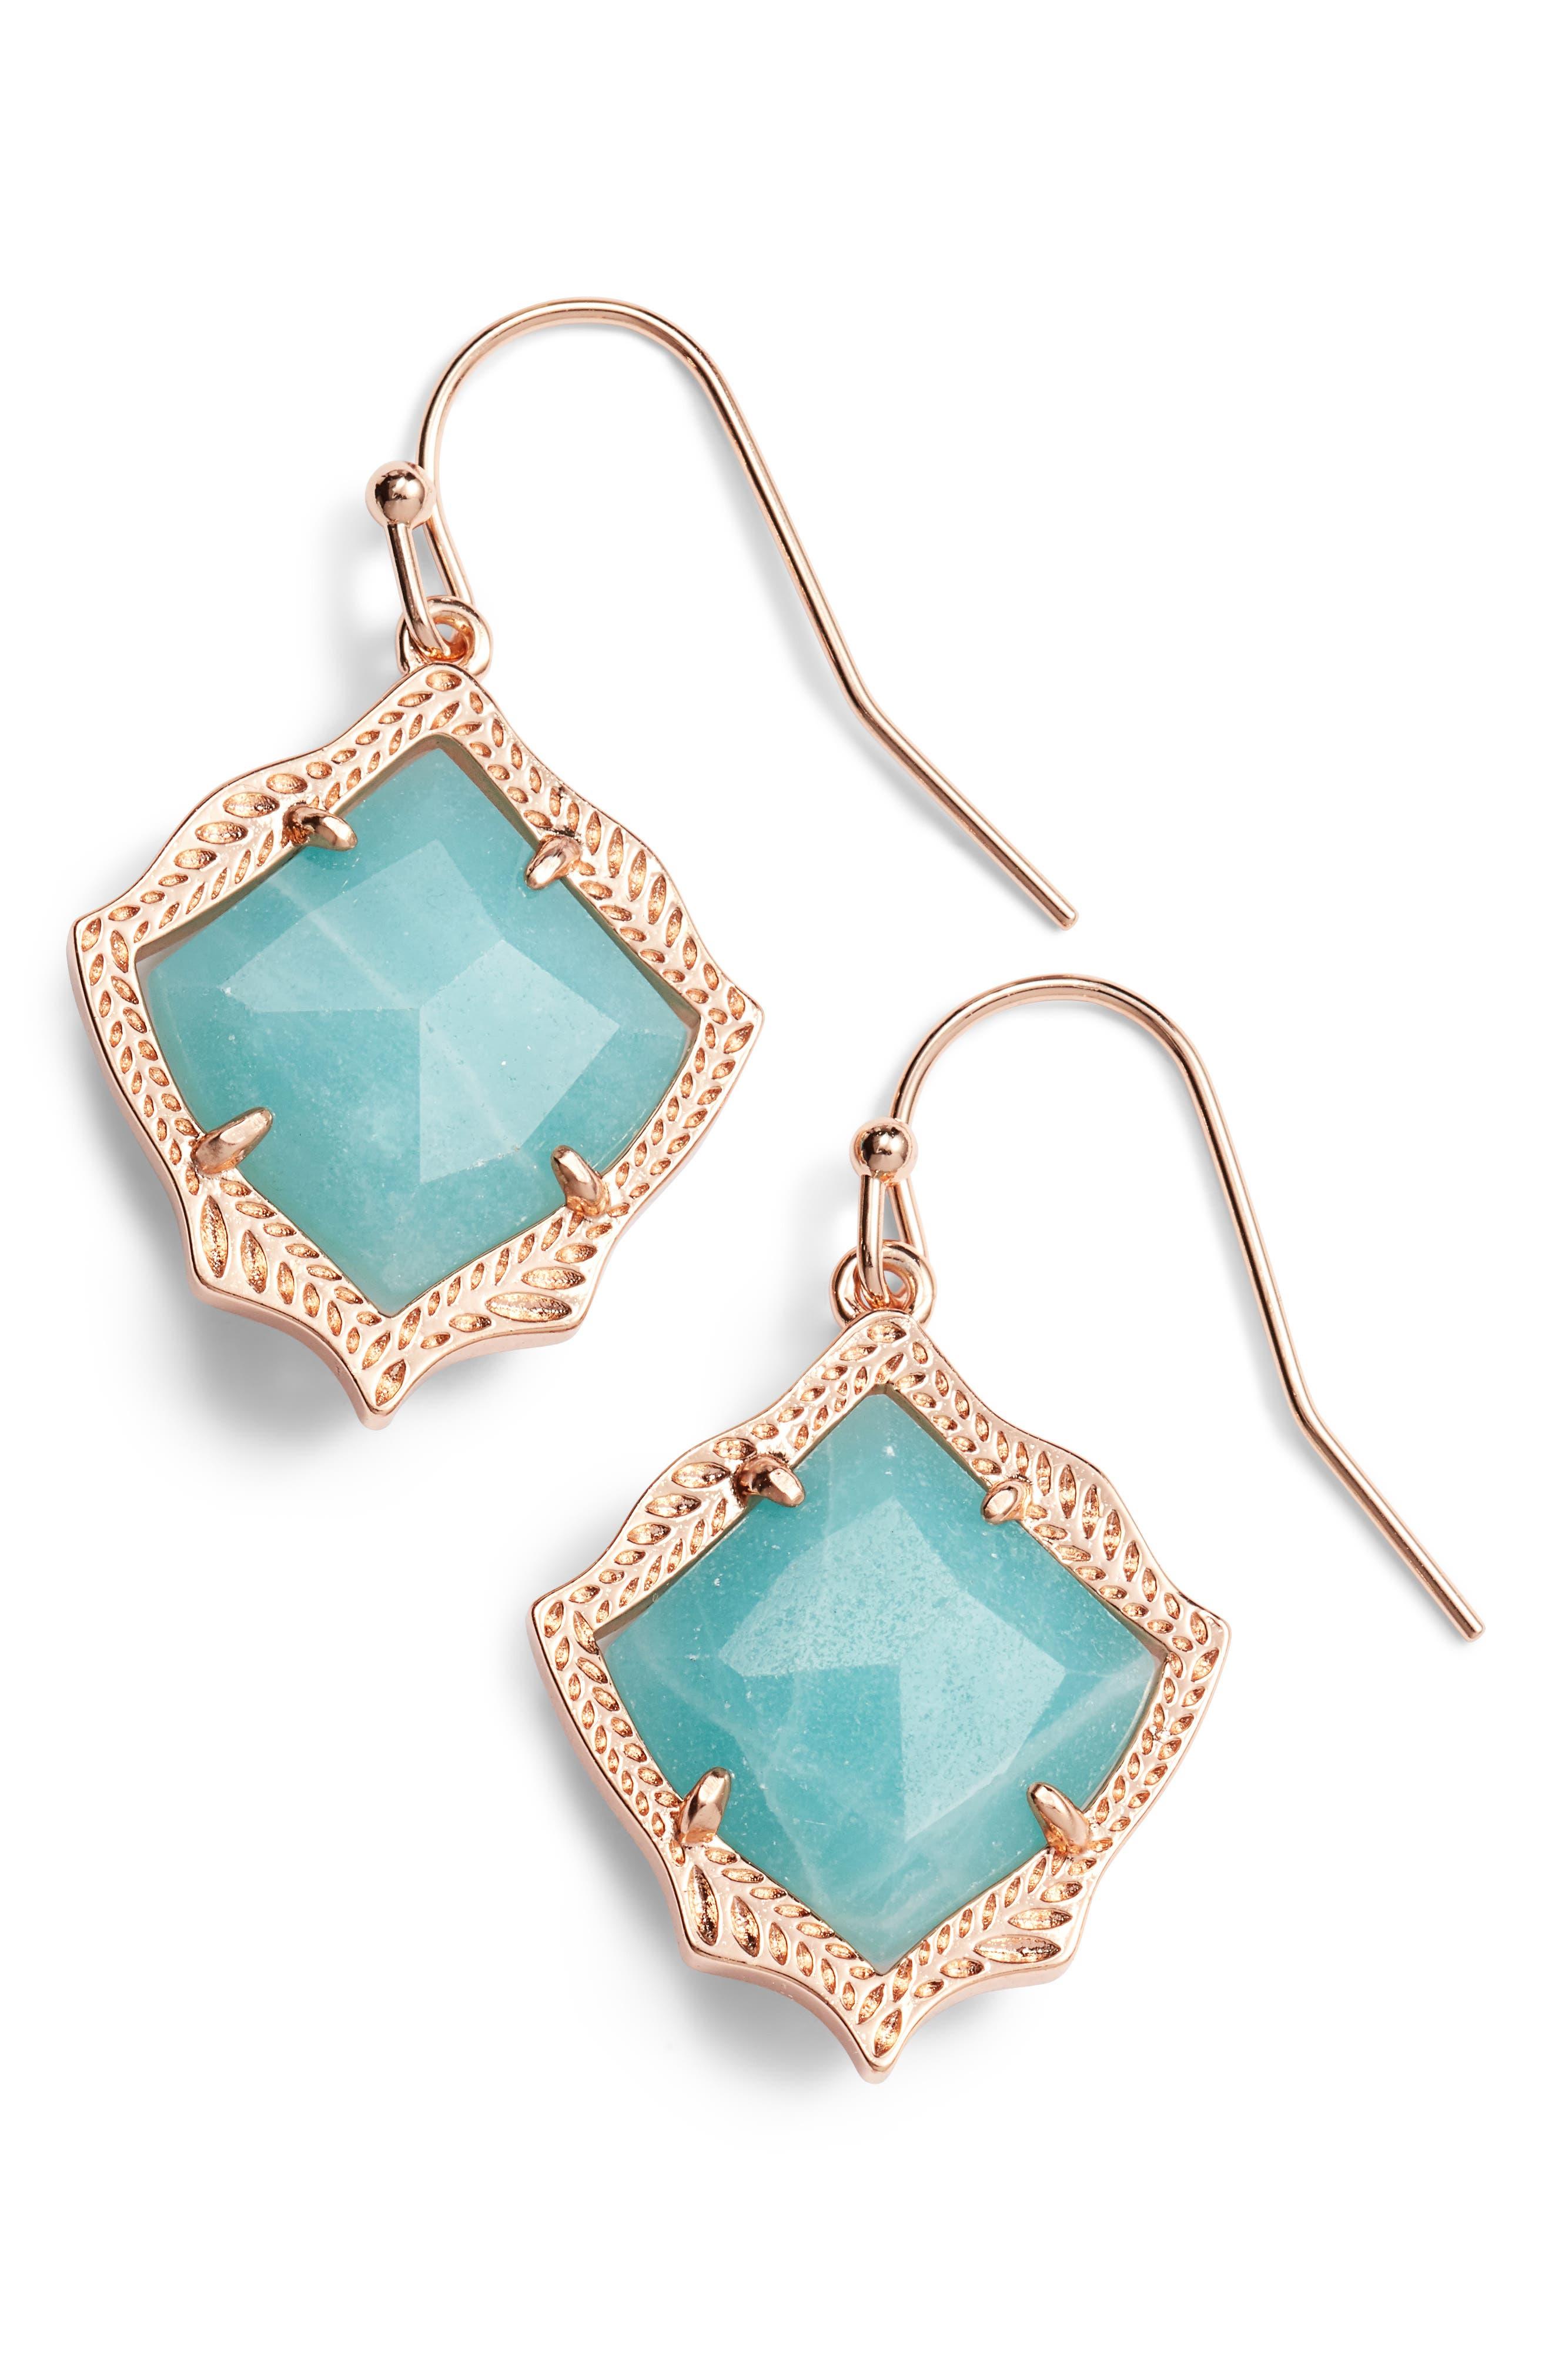 KENDRA SCOTT, Kyrie Drop Earrings, Main thumbnail 1, color, AMAZONITE/ ROSE GOLD